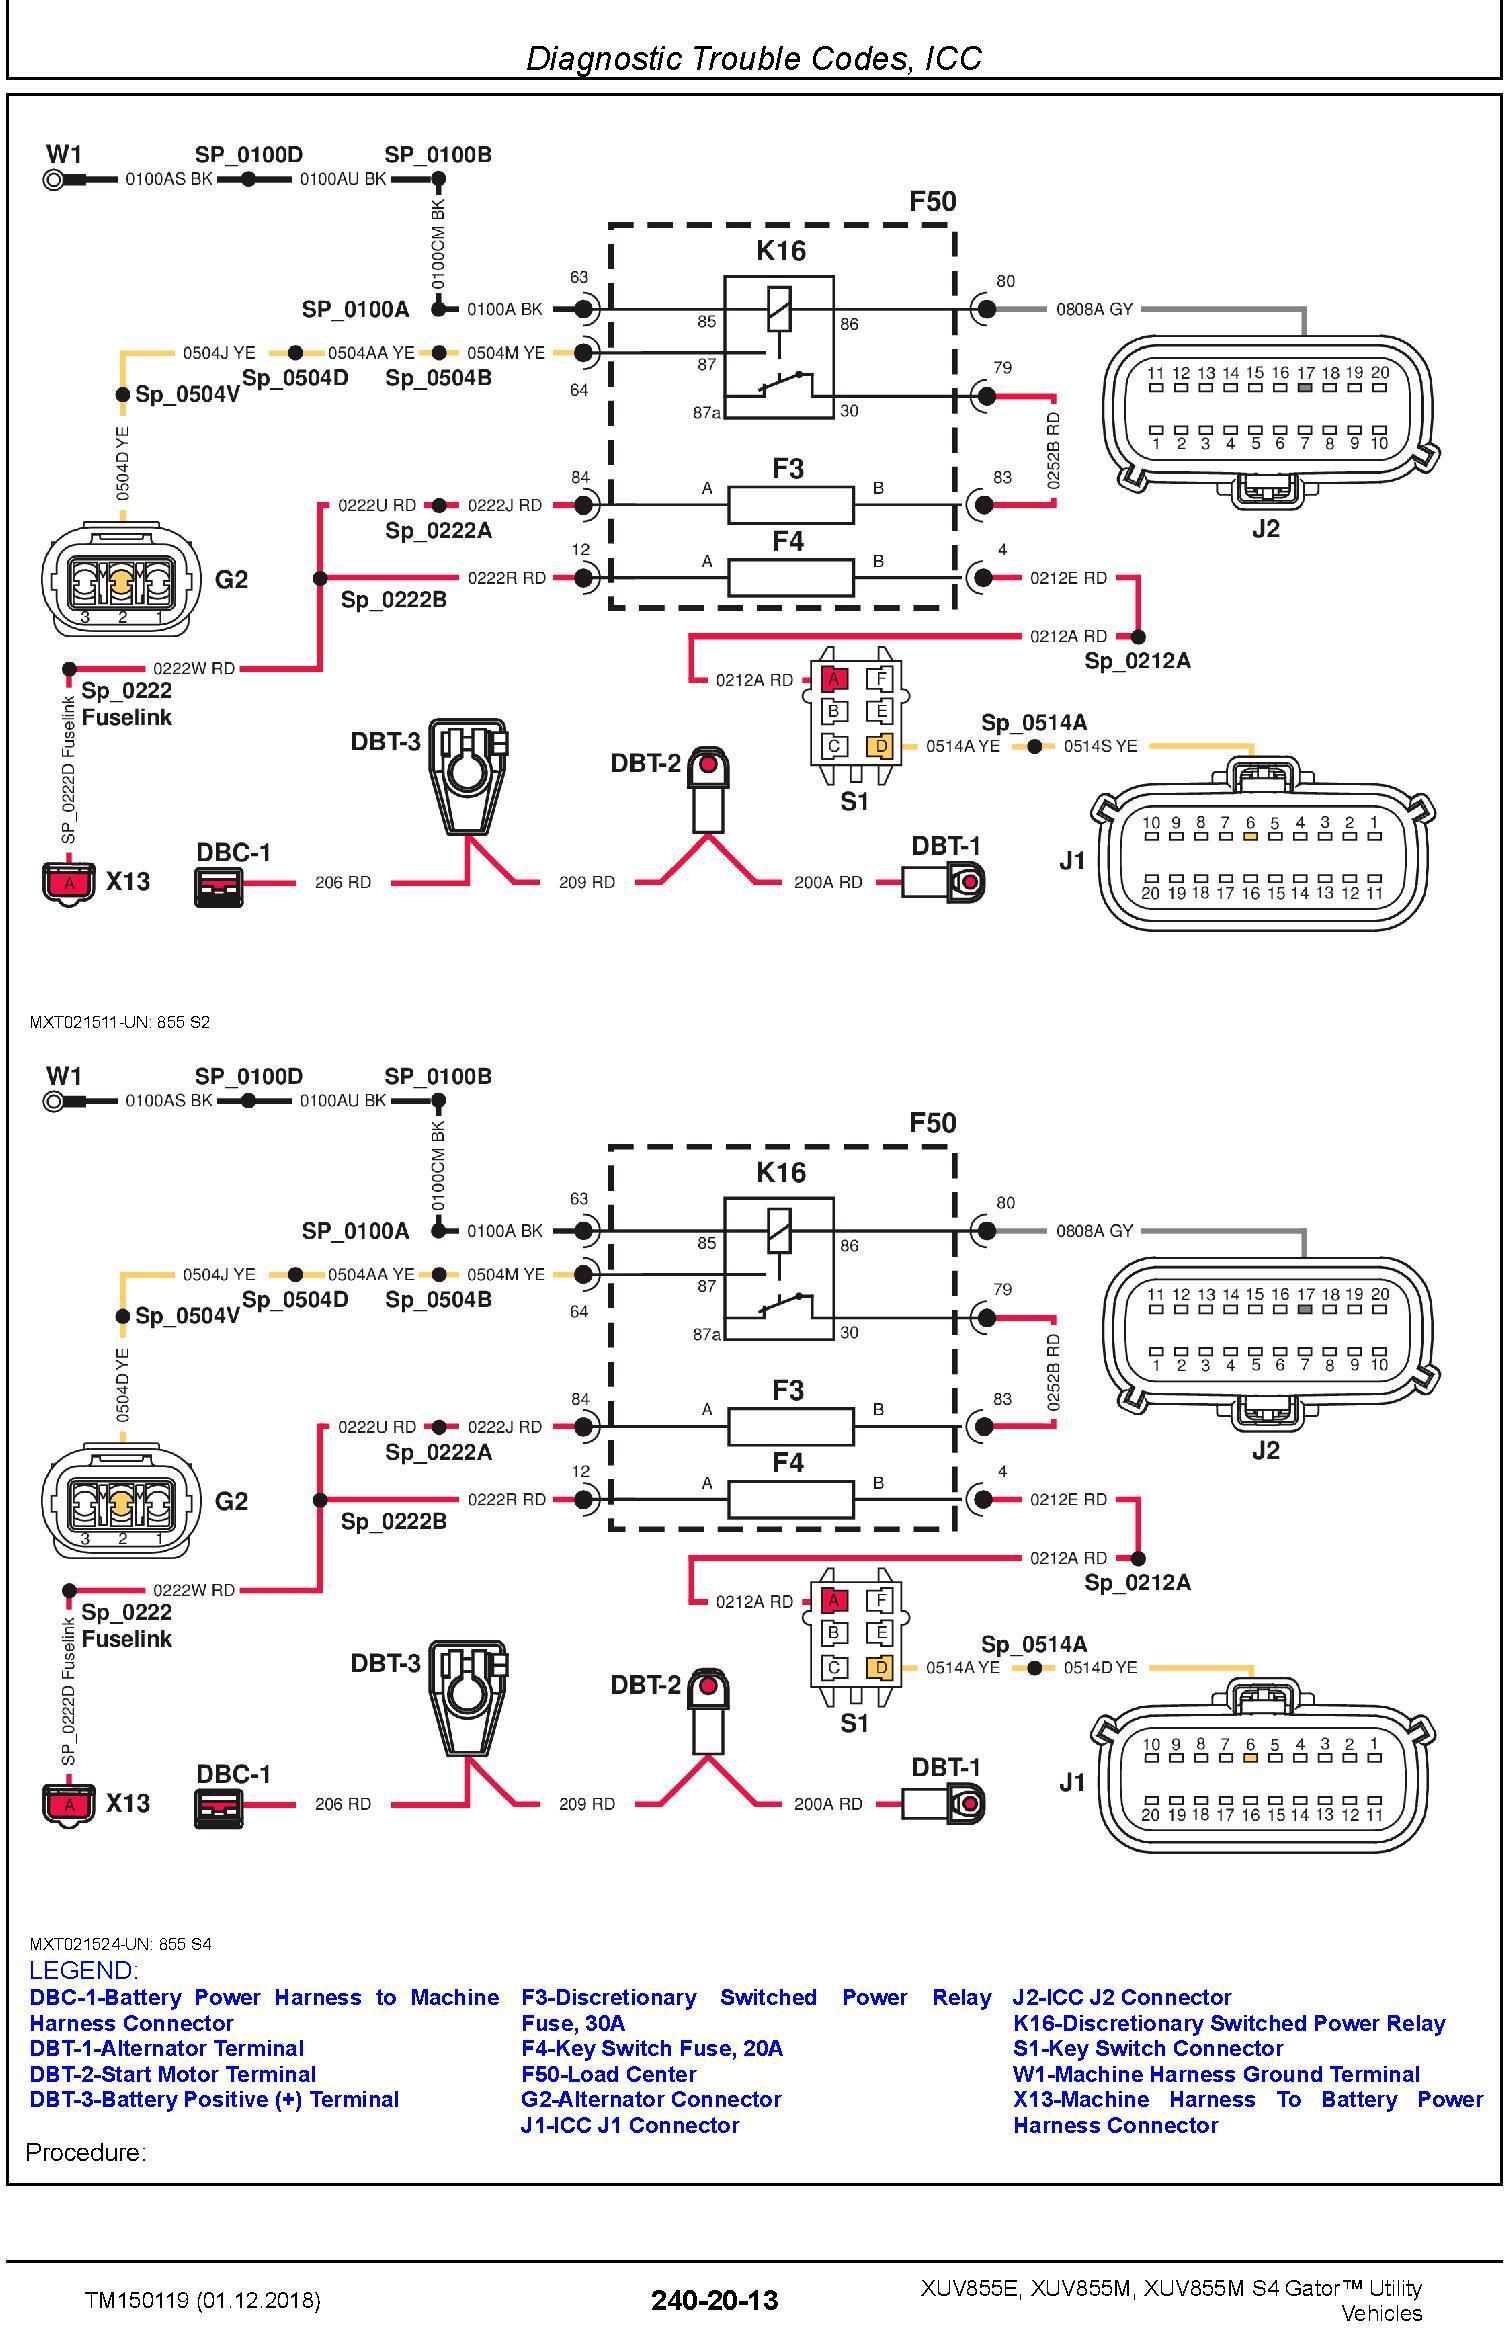 John Deere XUV855E XUV855M, XUV855M S4 Gator Utility Vehicles (SN.010001-) Technical Manual TM150119 - 3